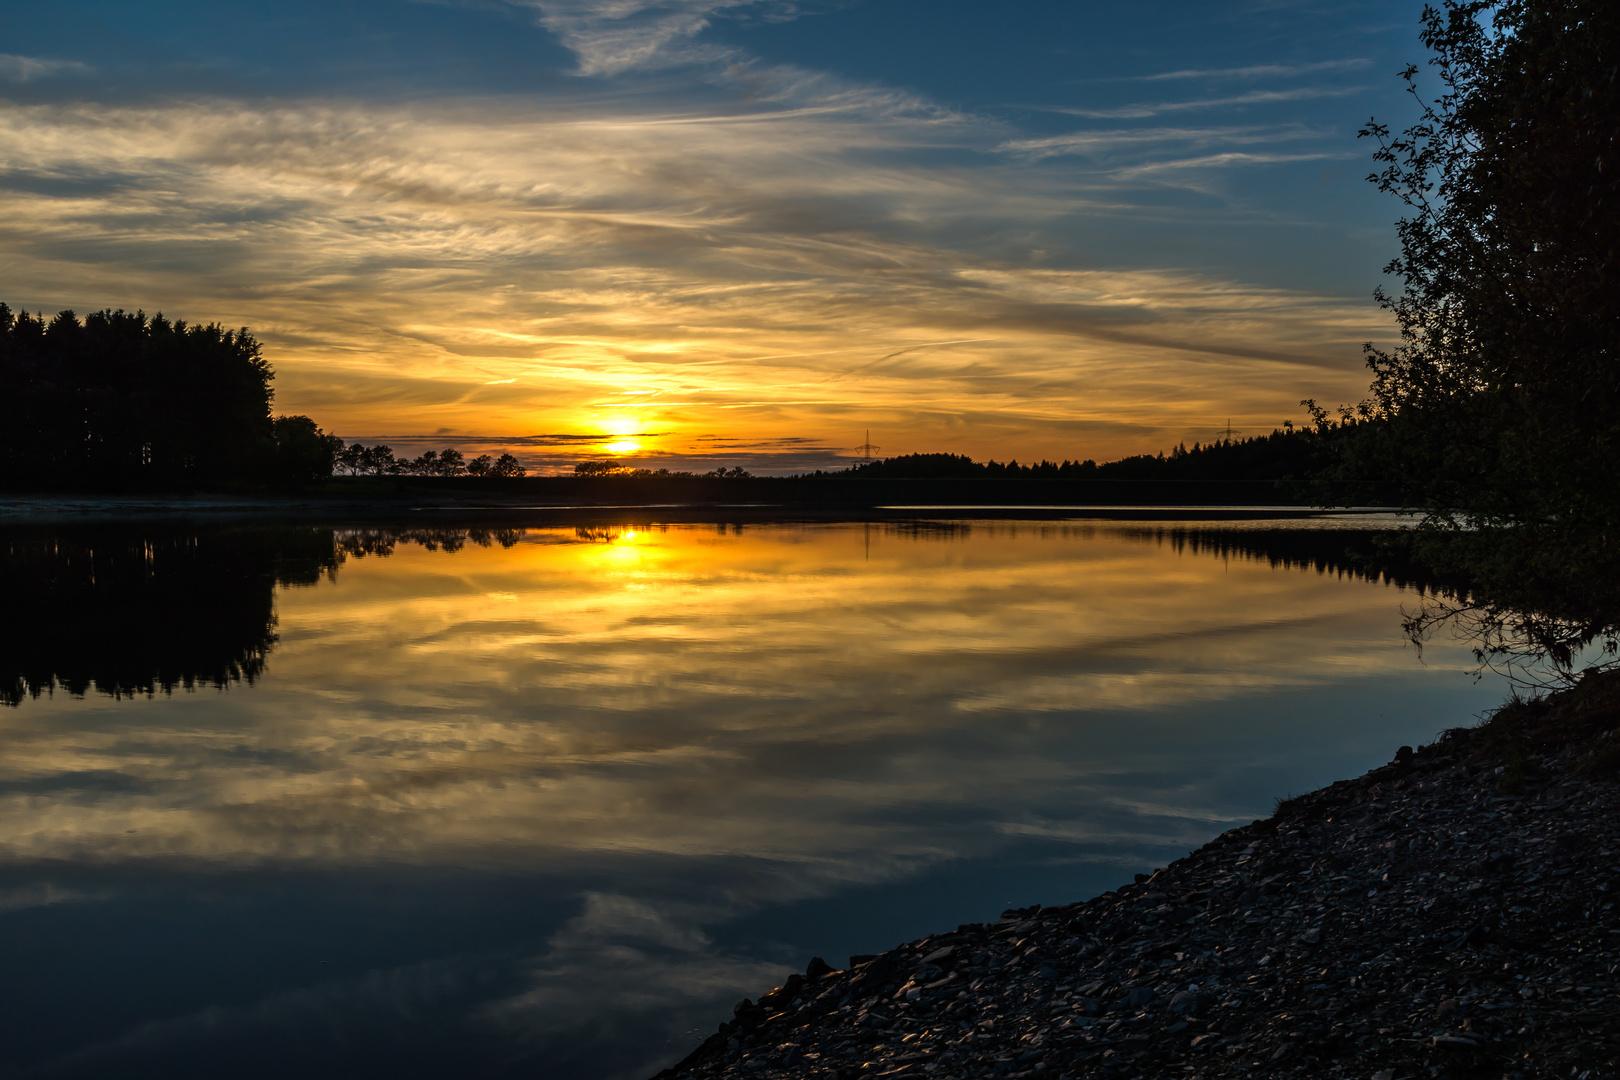 Sonnenuntergang Querentalsperre